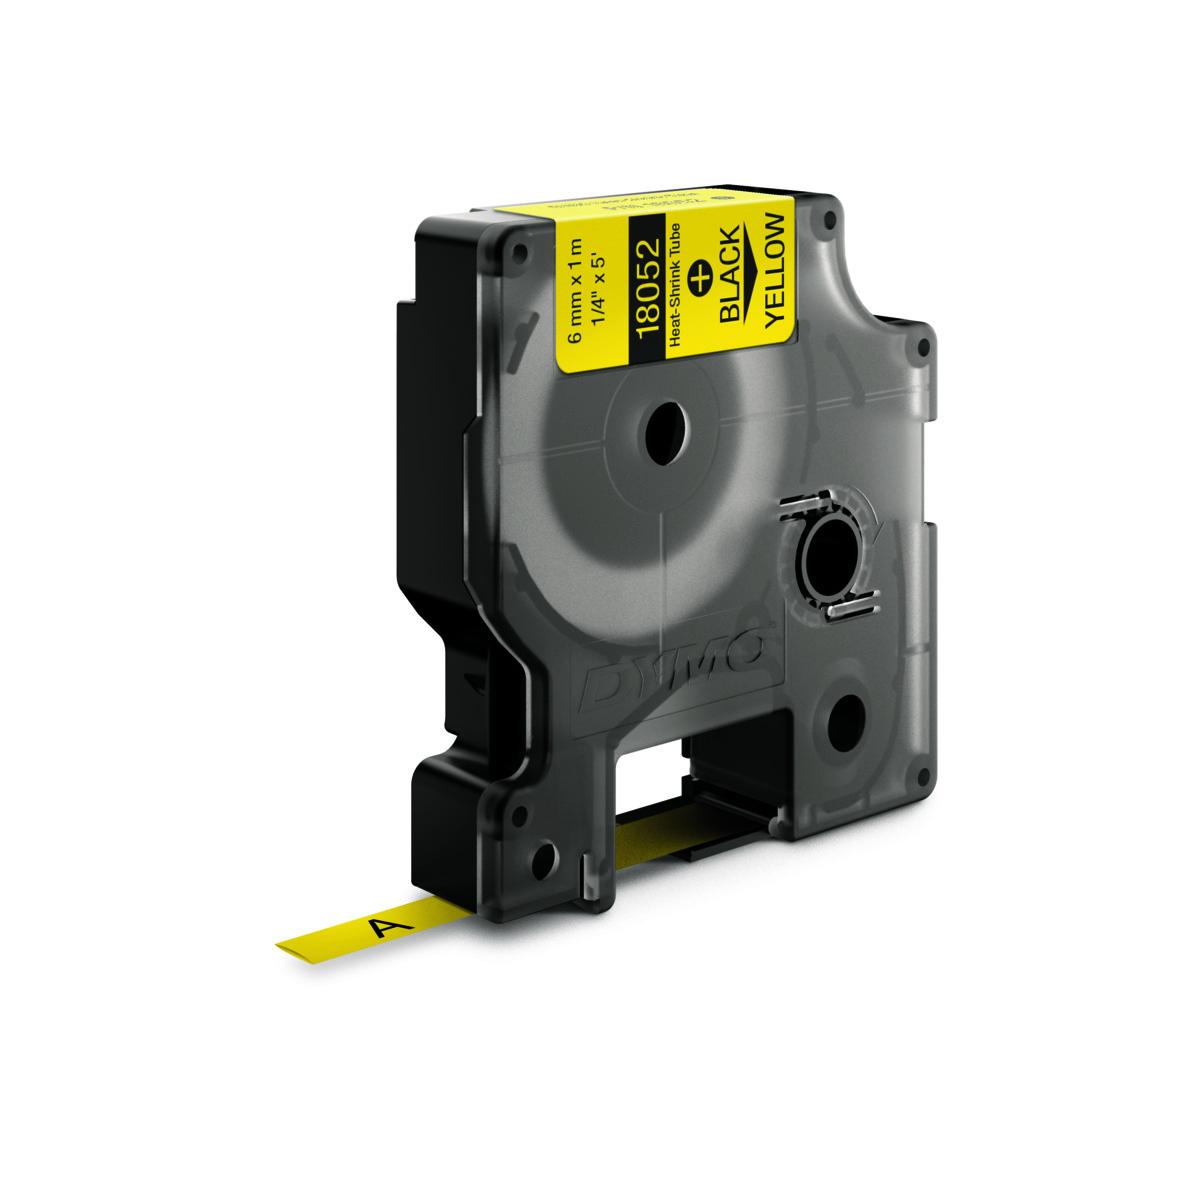 Dymo RHINO 18052 - IND Krimpkous label - 6mm zwart op geel